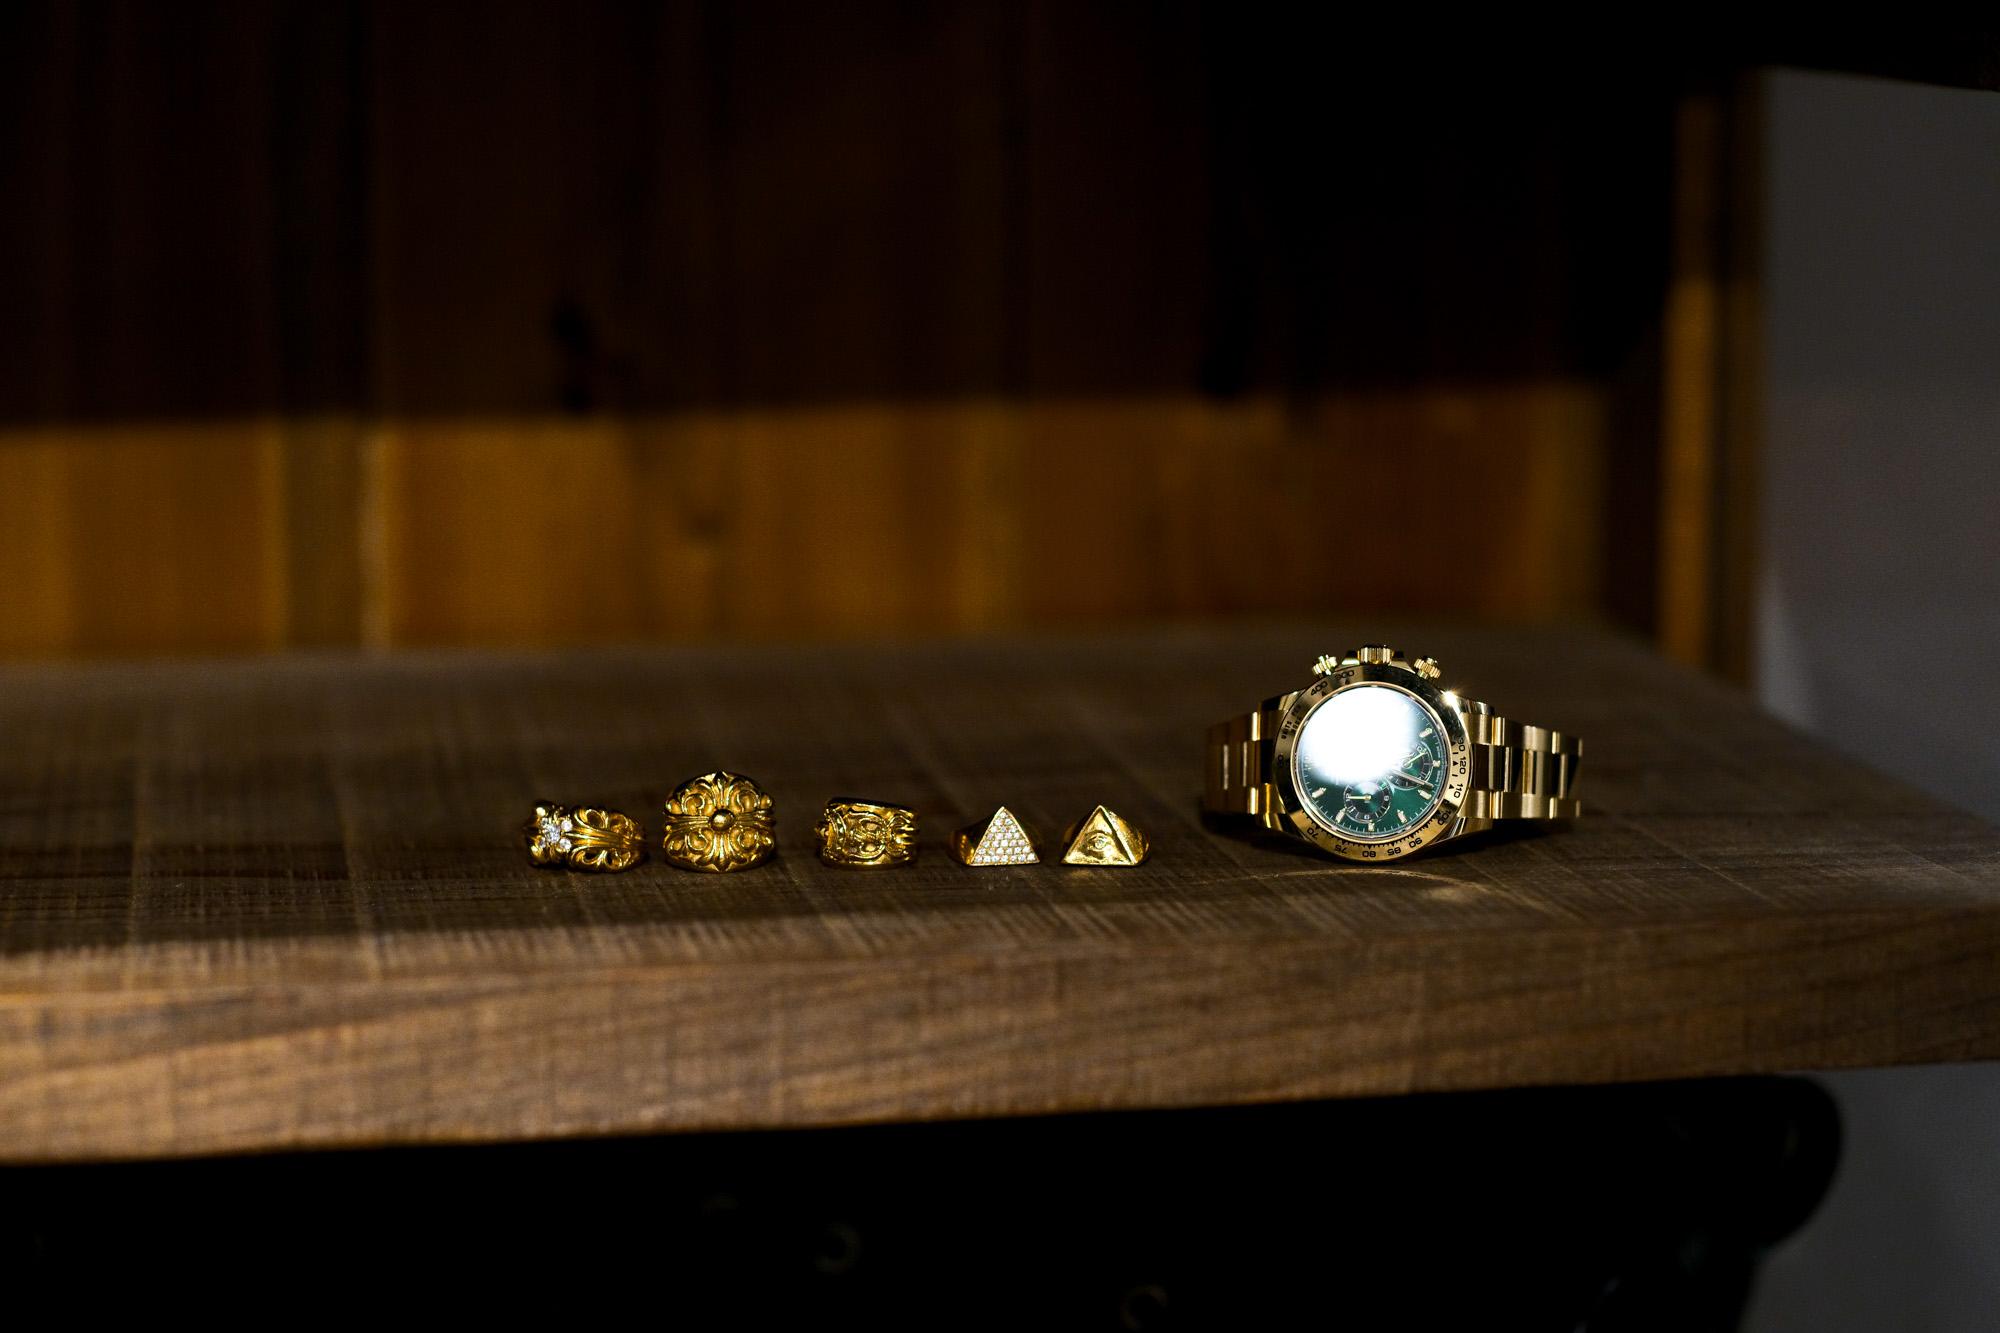 "CHROME HEARTS ""K&T RING 5 WHITE DIAMOND 22K GOLD"" × CHROME HEARTS ""Keeper Ring 22K GOLD"" × CHROME HEARTS ""DAGGER RING 22K GOLD"" × FIXER ""ILLUMINATI EYES RING FULL PAVE WHITE DIAMOND 22K GOLD"" × FIXER ""ILLUMINATI EYES RING WHITE DIAMOND 22K GOLD SP"" × ROLEX ""COSMOGRAPH DAYTONA 116508"" ロレックス デイトナ デイトナグリーン グリーンダイヤル クロムハーツ KTリング 5ダイヤ キーパーリング ダガーリング フィクサー イルミナティ アイズリング フルパヴェ ホワイトダイヤモンド 愛知 名古屋 Alto e Diritto altoediritto アルトエデリット スペシャルコーディネート 宝物 傷だらけまるけ"